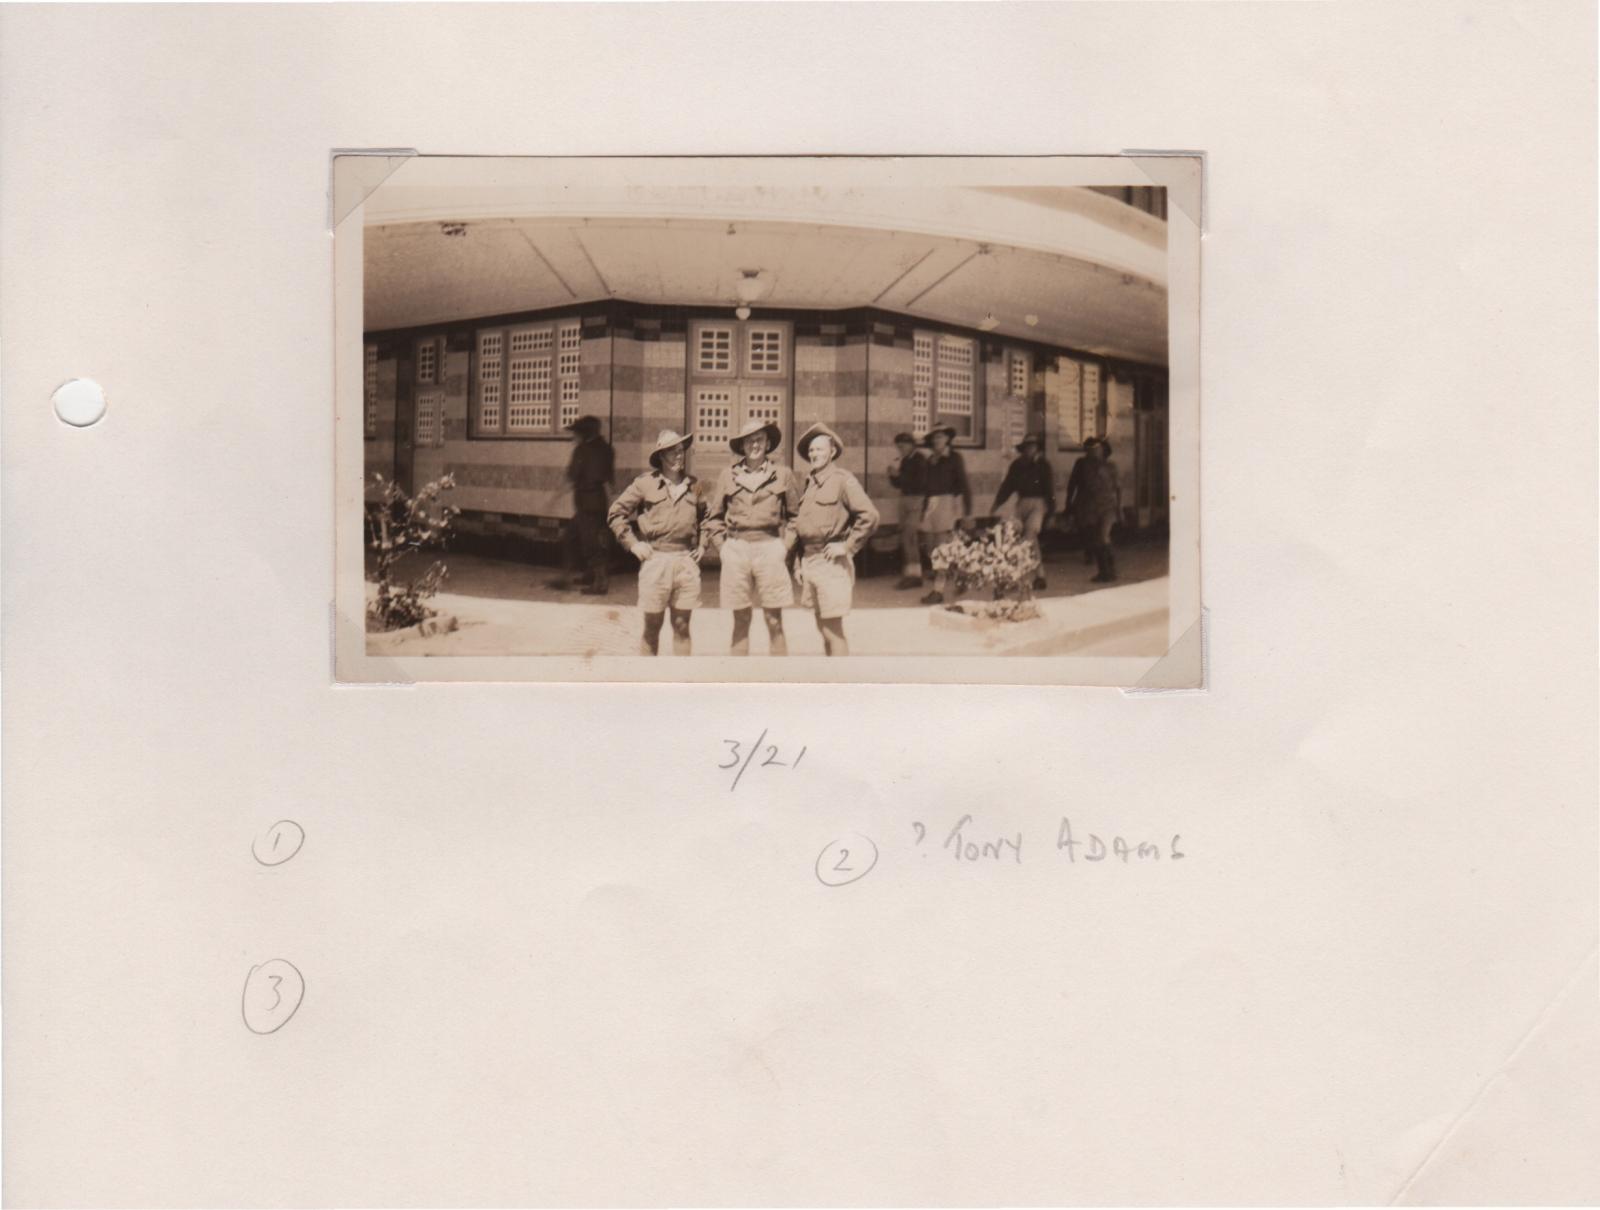 Dili scene Jan 1942 - Tony Adams middle.jpeg